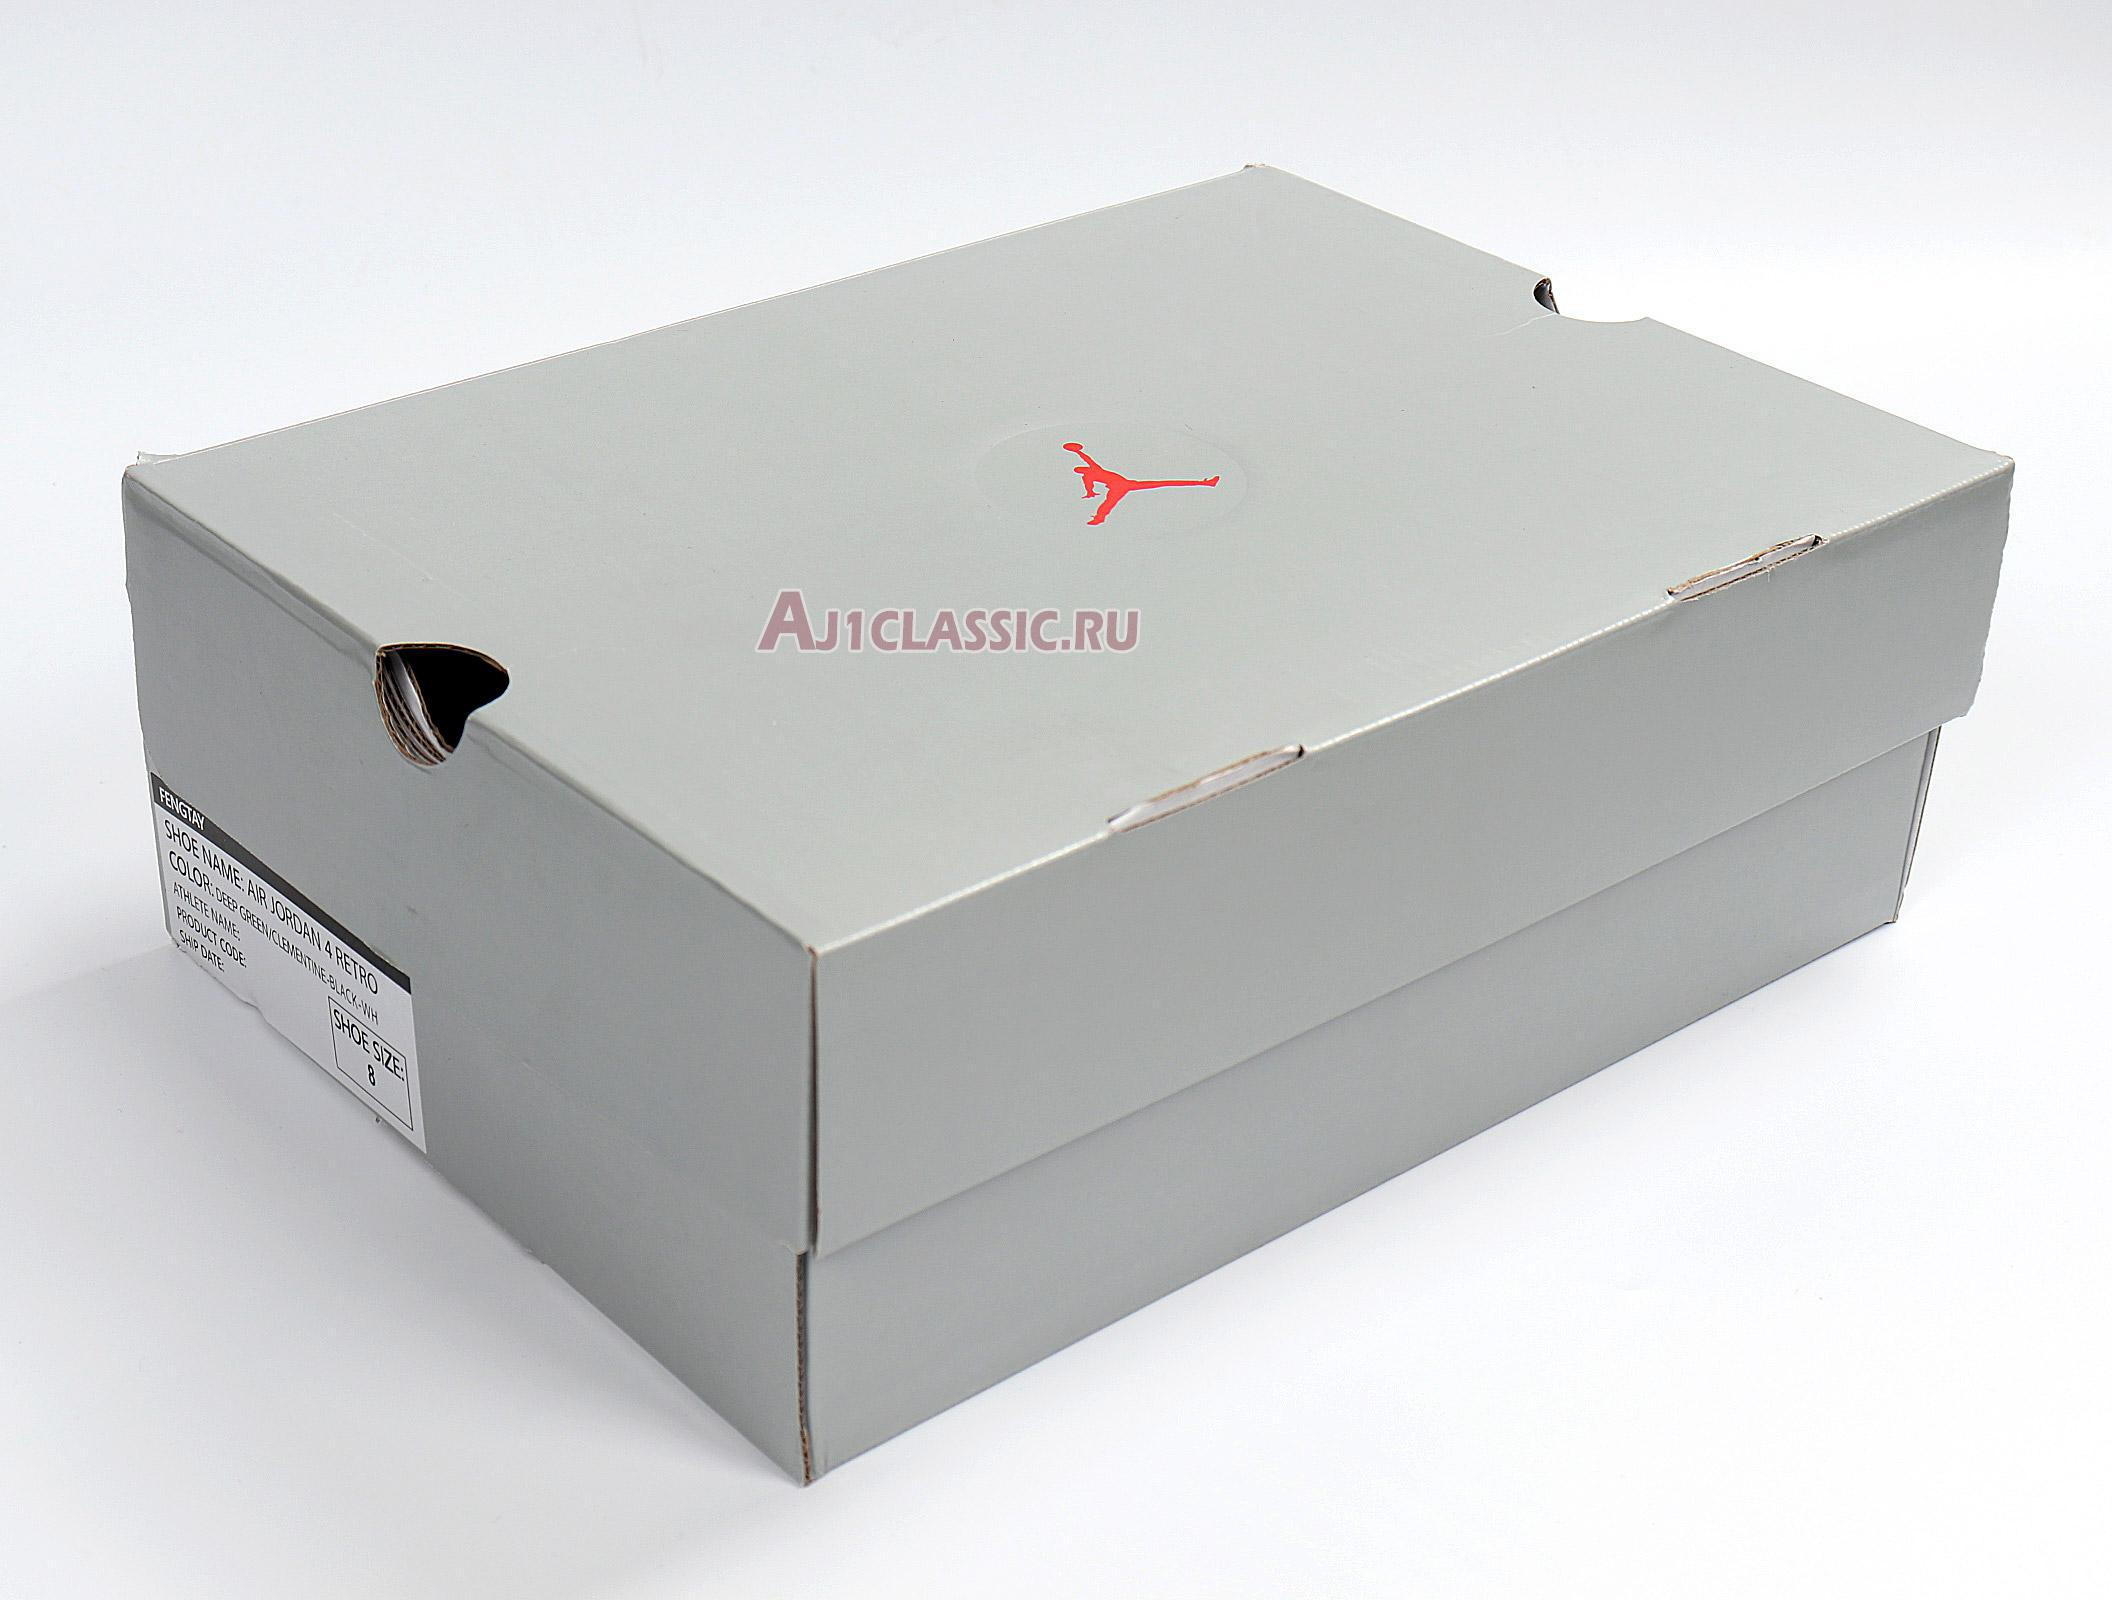 Undefeated x Air Jordan 4 Retro JBM351-M1